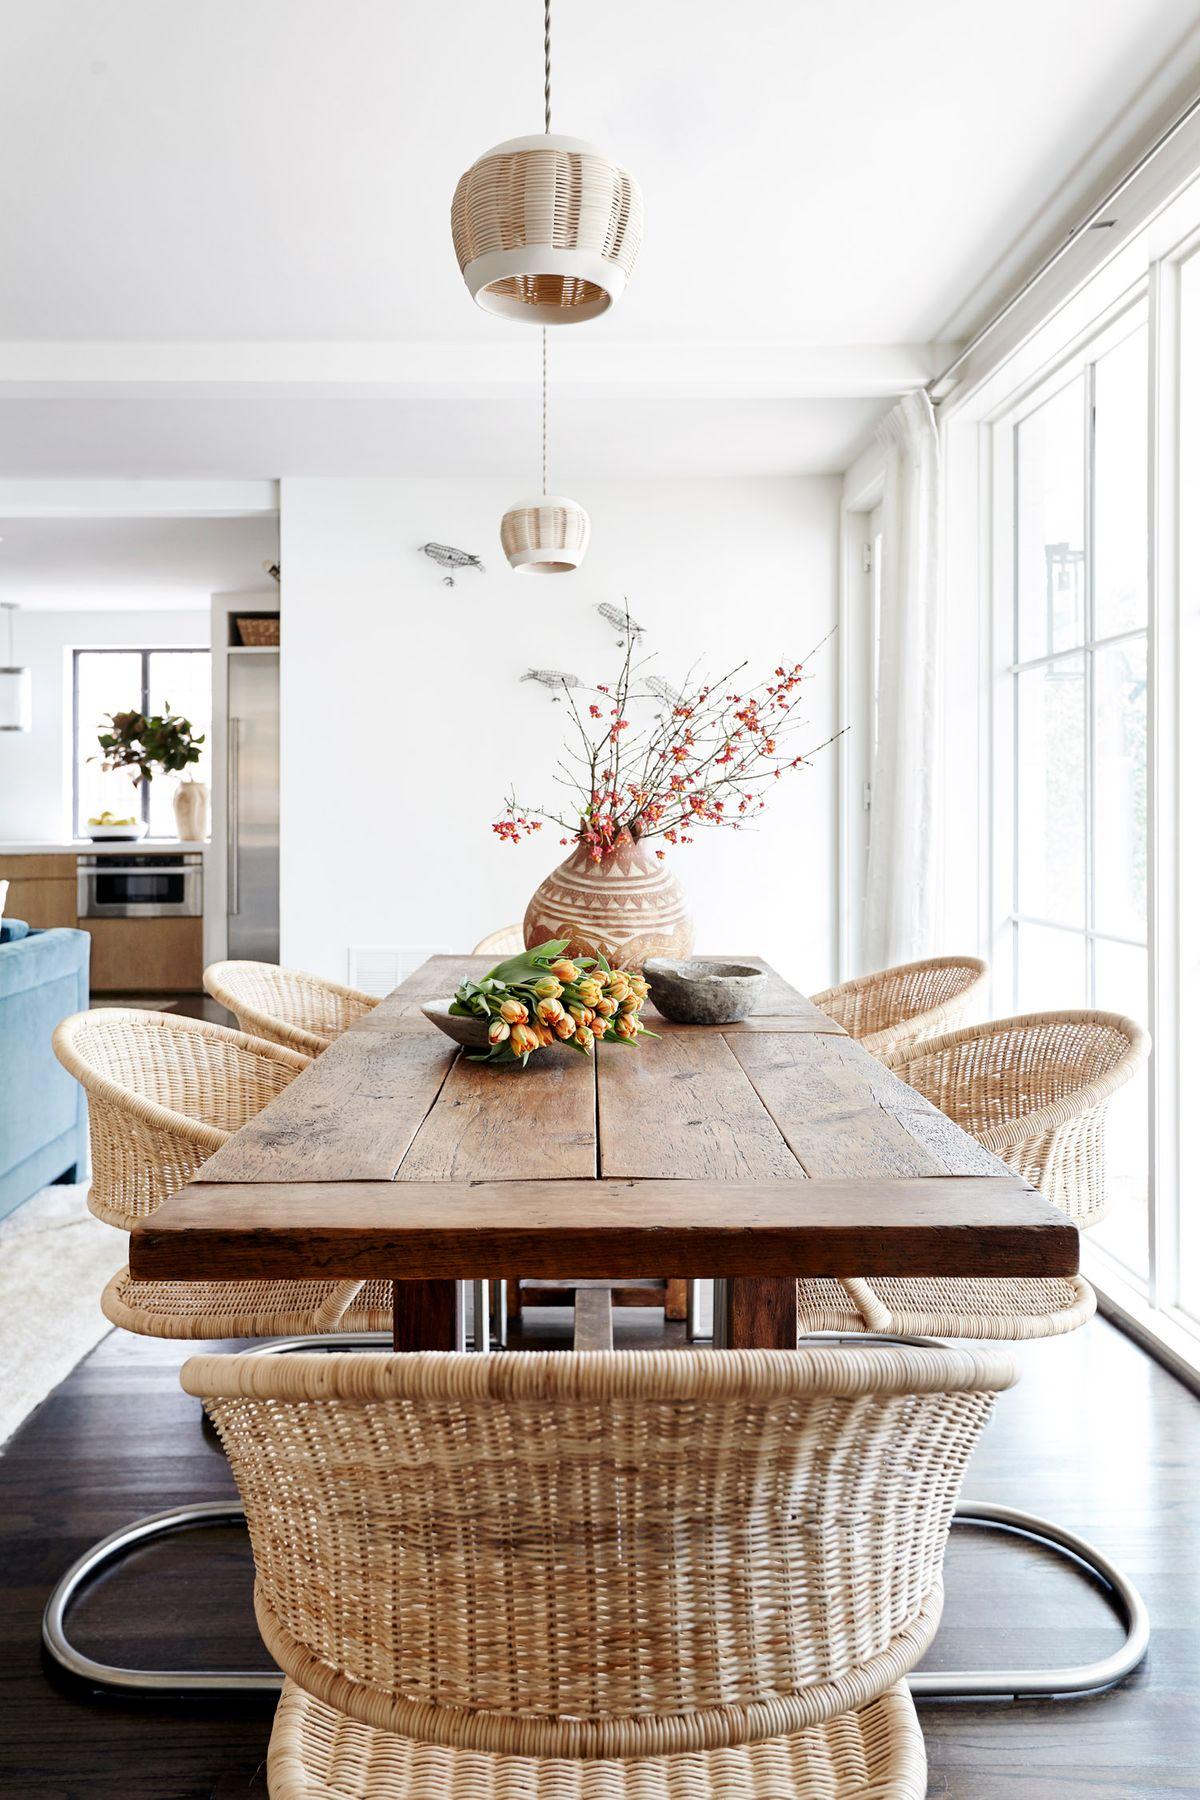 Pär Bengtsson Home Interior Editorial Photography30.jpg